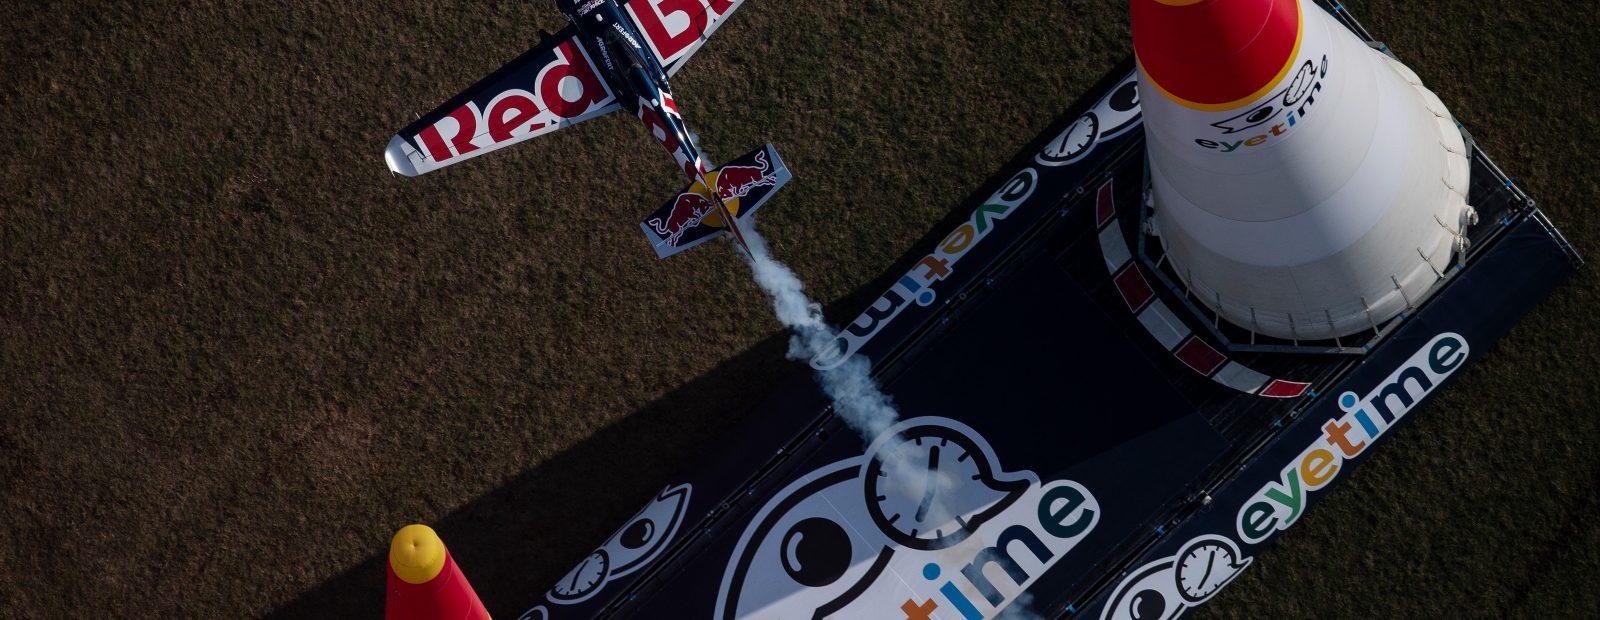 Foto: Joerg Mitter / Red Bull Content Pool